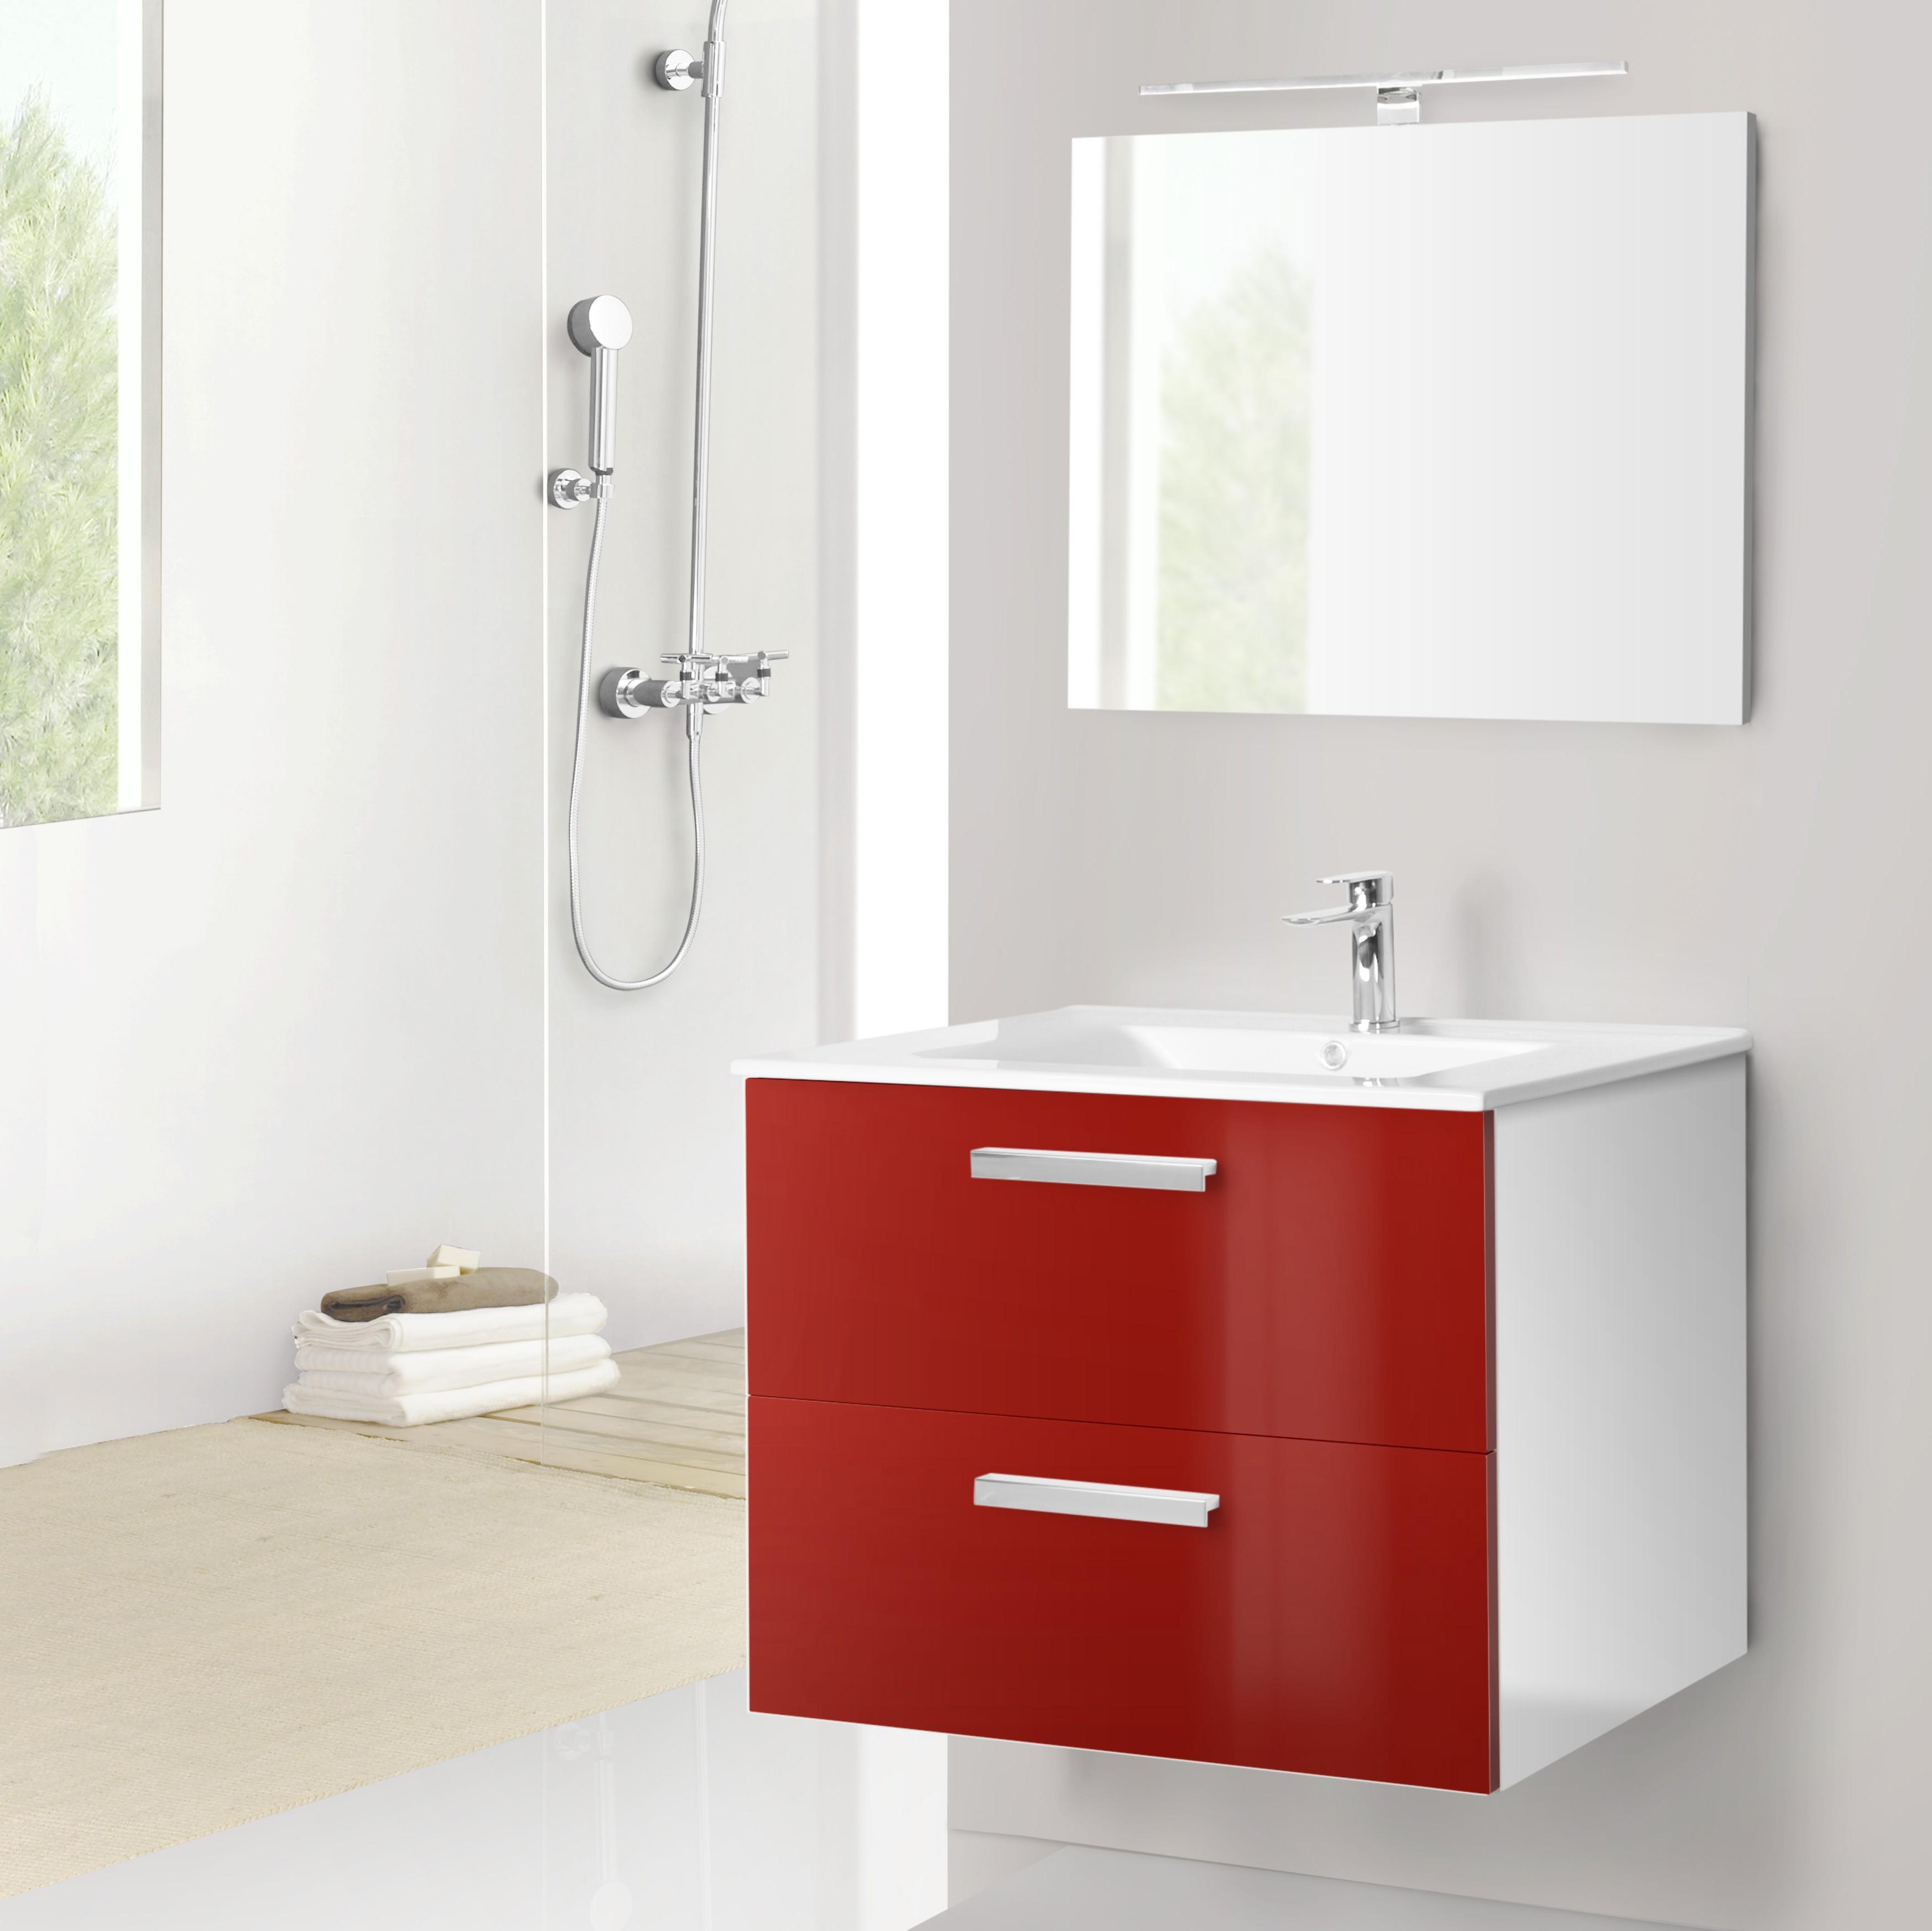 Muebles Para Baño Ferrari:Modelo Nova Fondo reducido 395